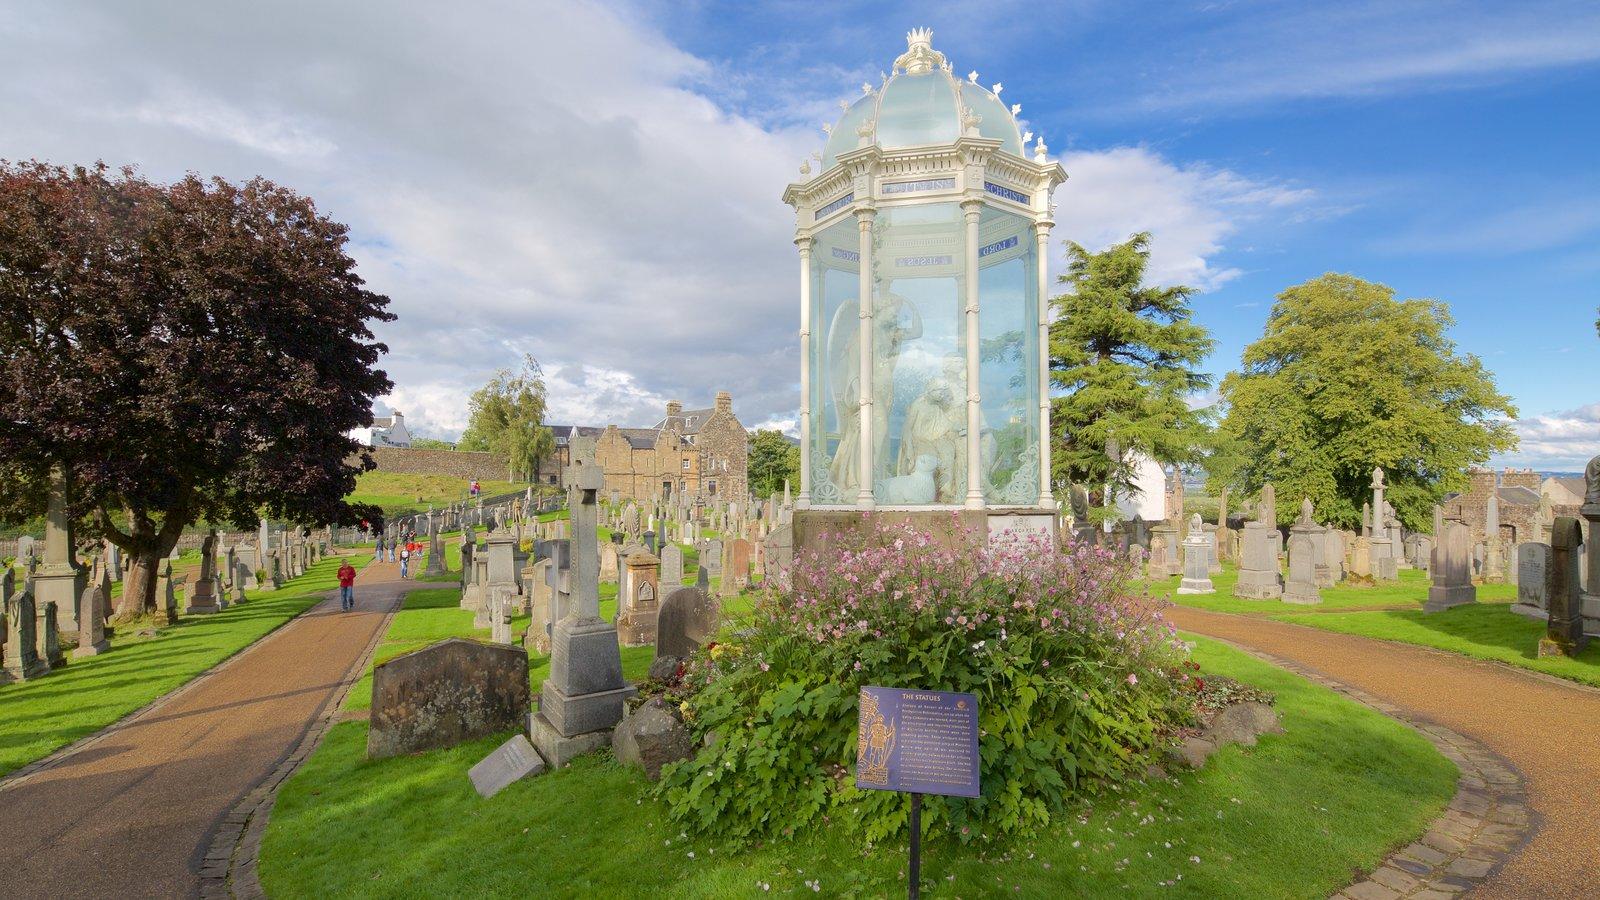 Stirling caracterizando um cemitério